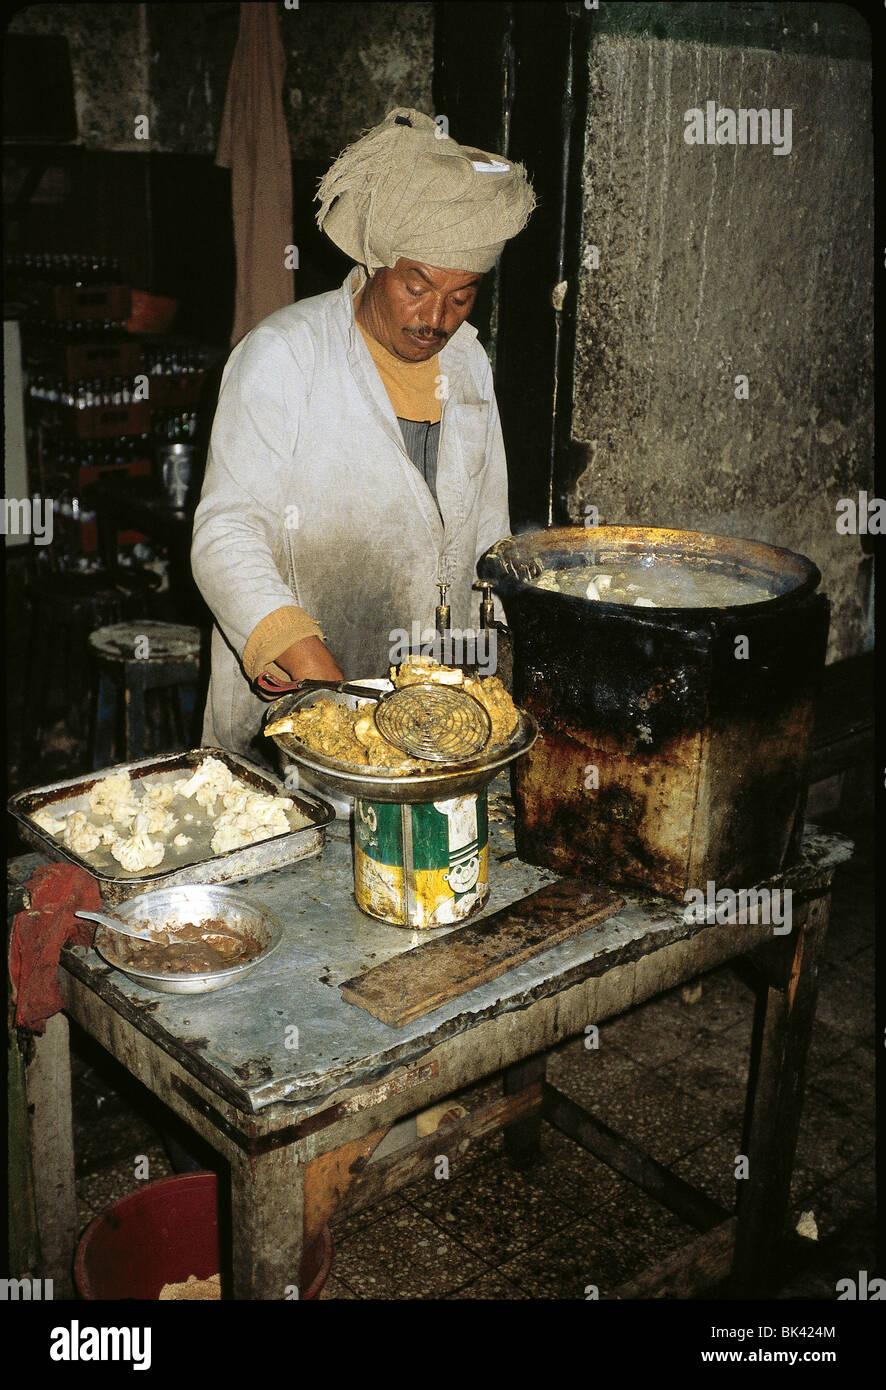 Vendor frying food, Egypt - Stock Image